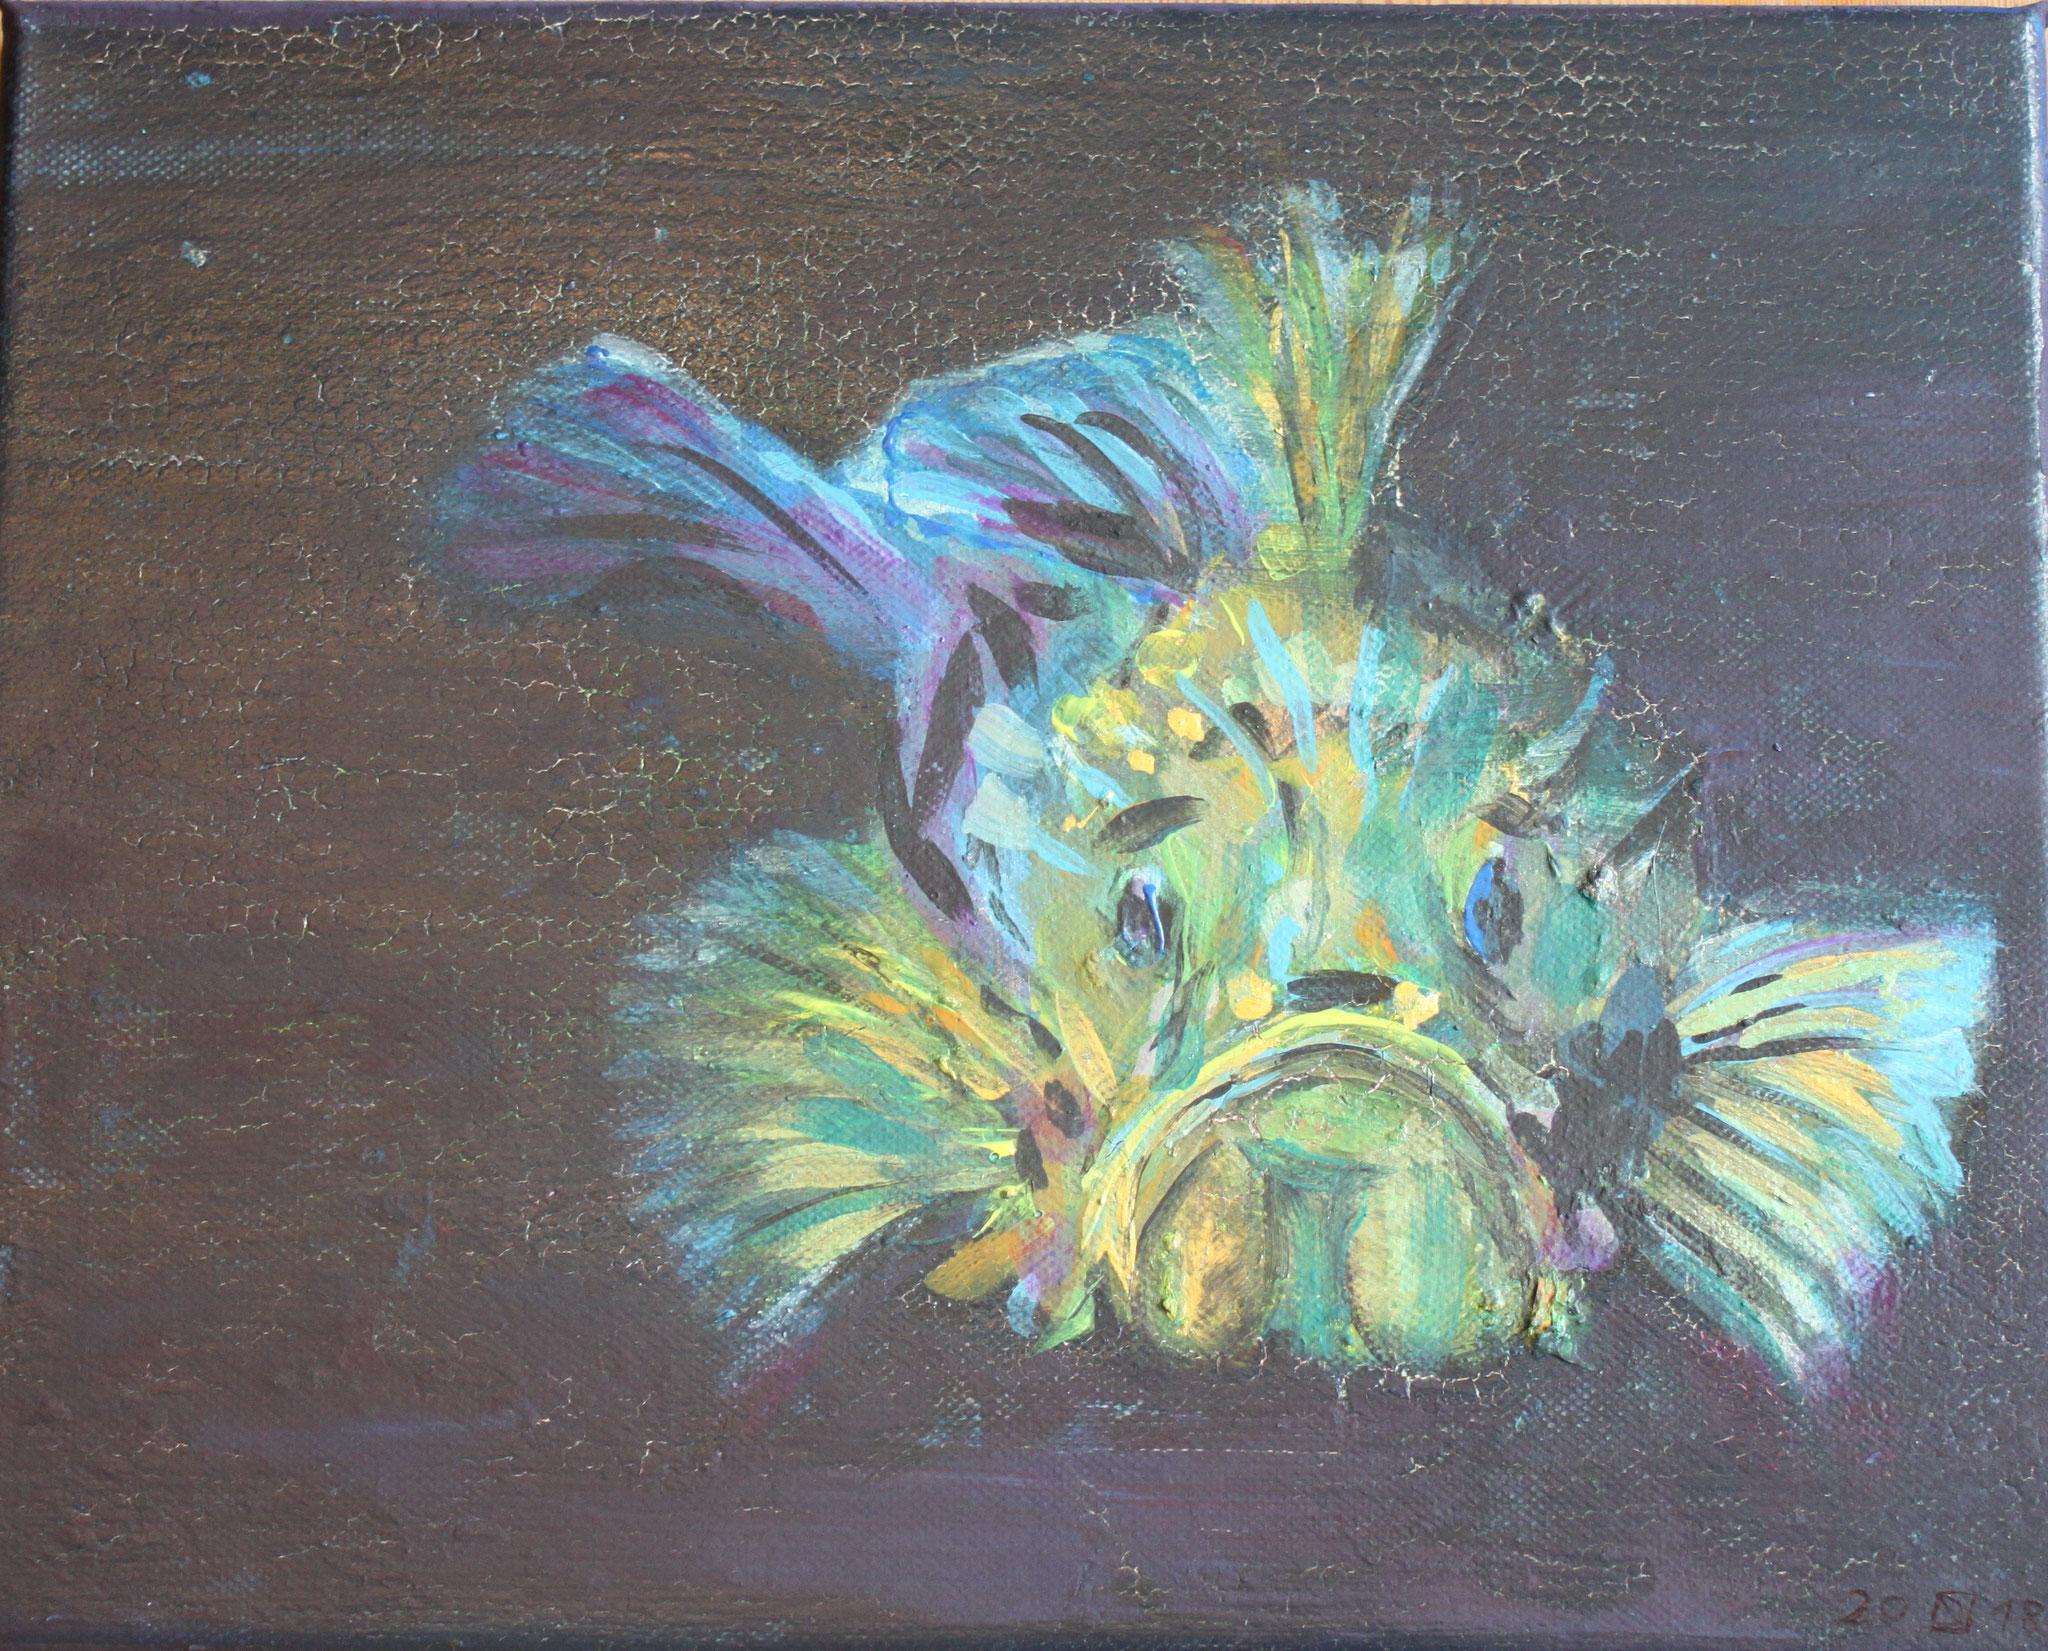 Seeteufel, Acryl auf Leinwand, 2018, 25 cm x 30 cm x 1 cm